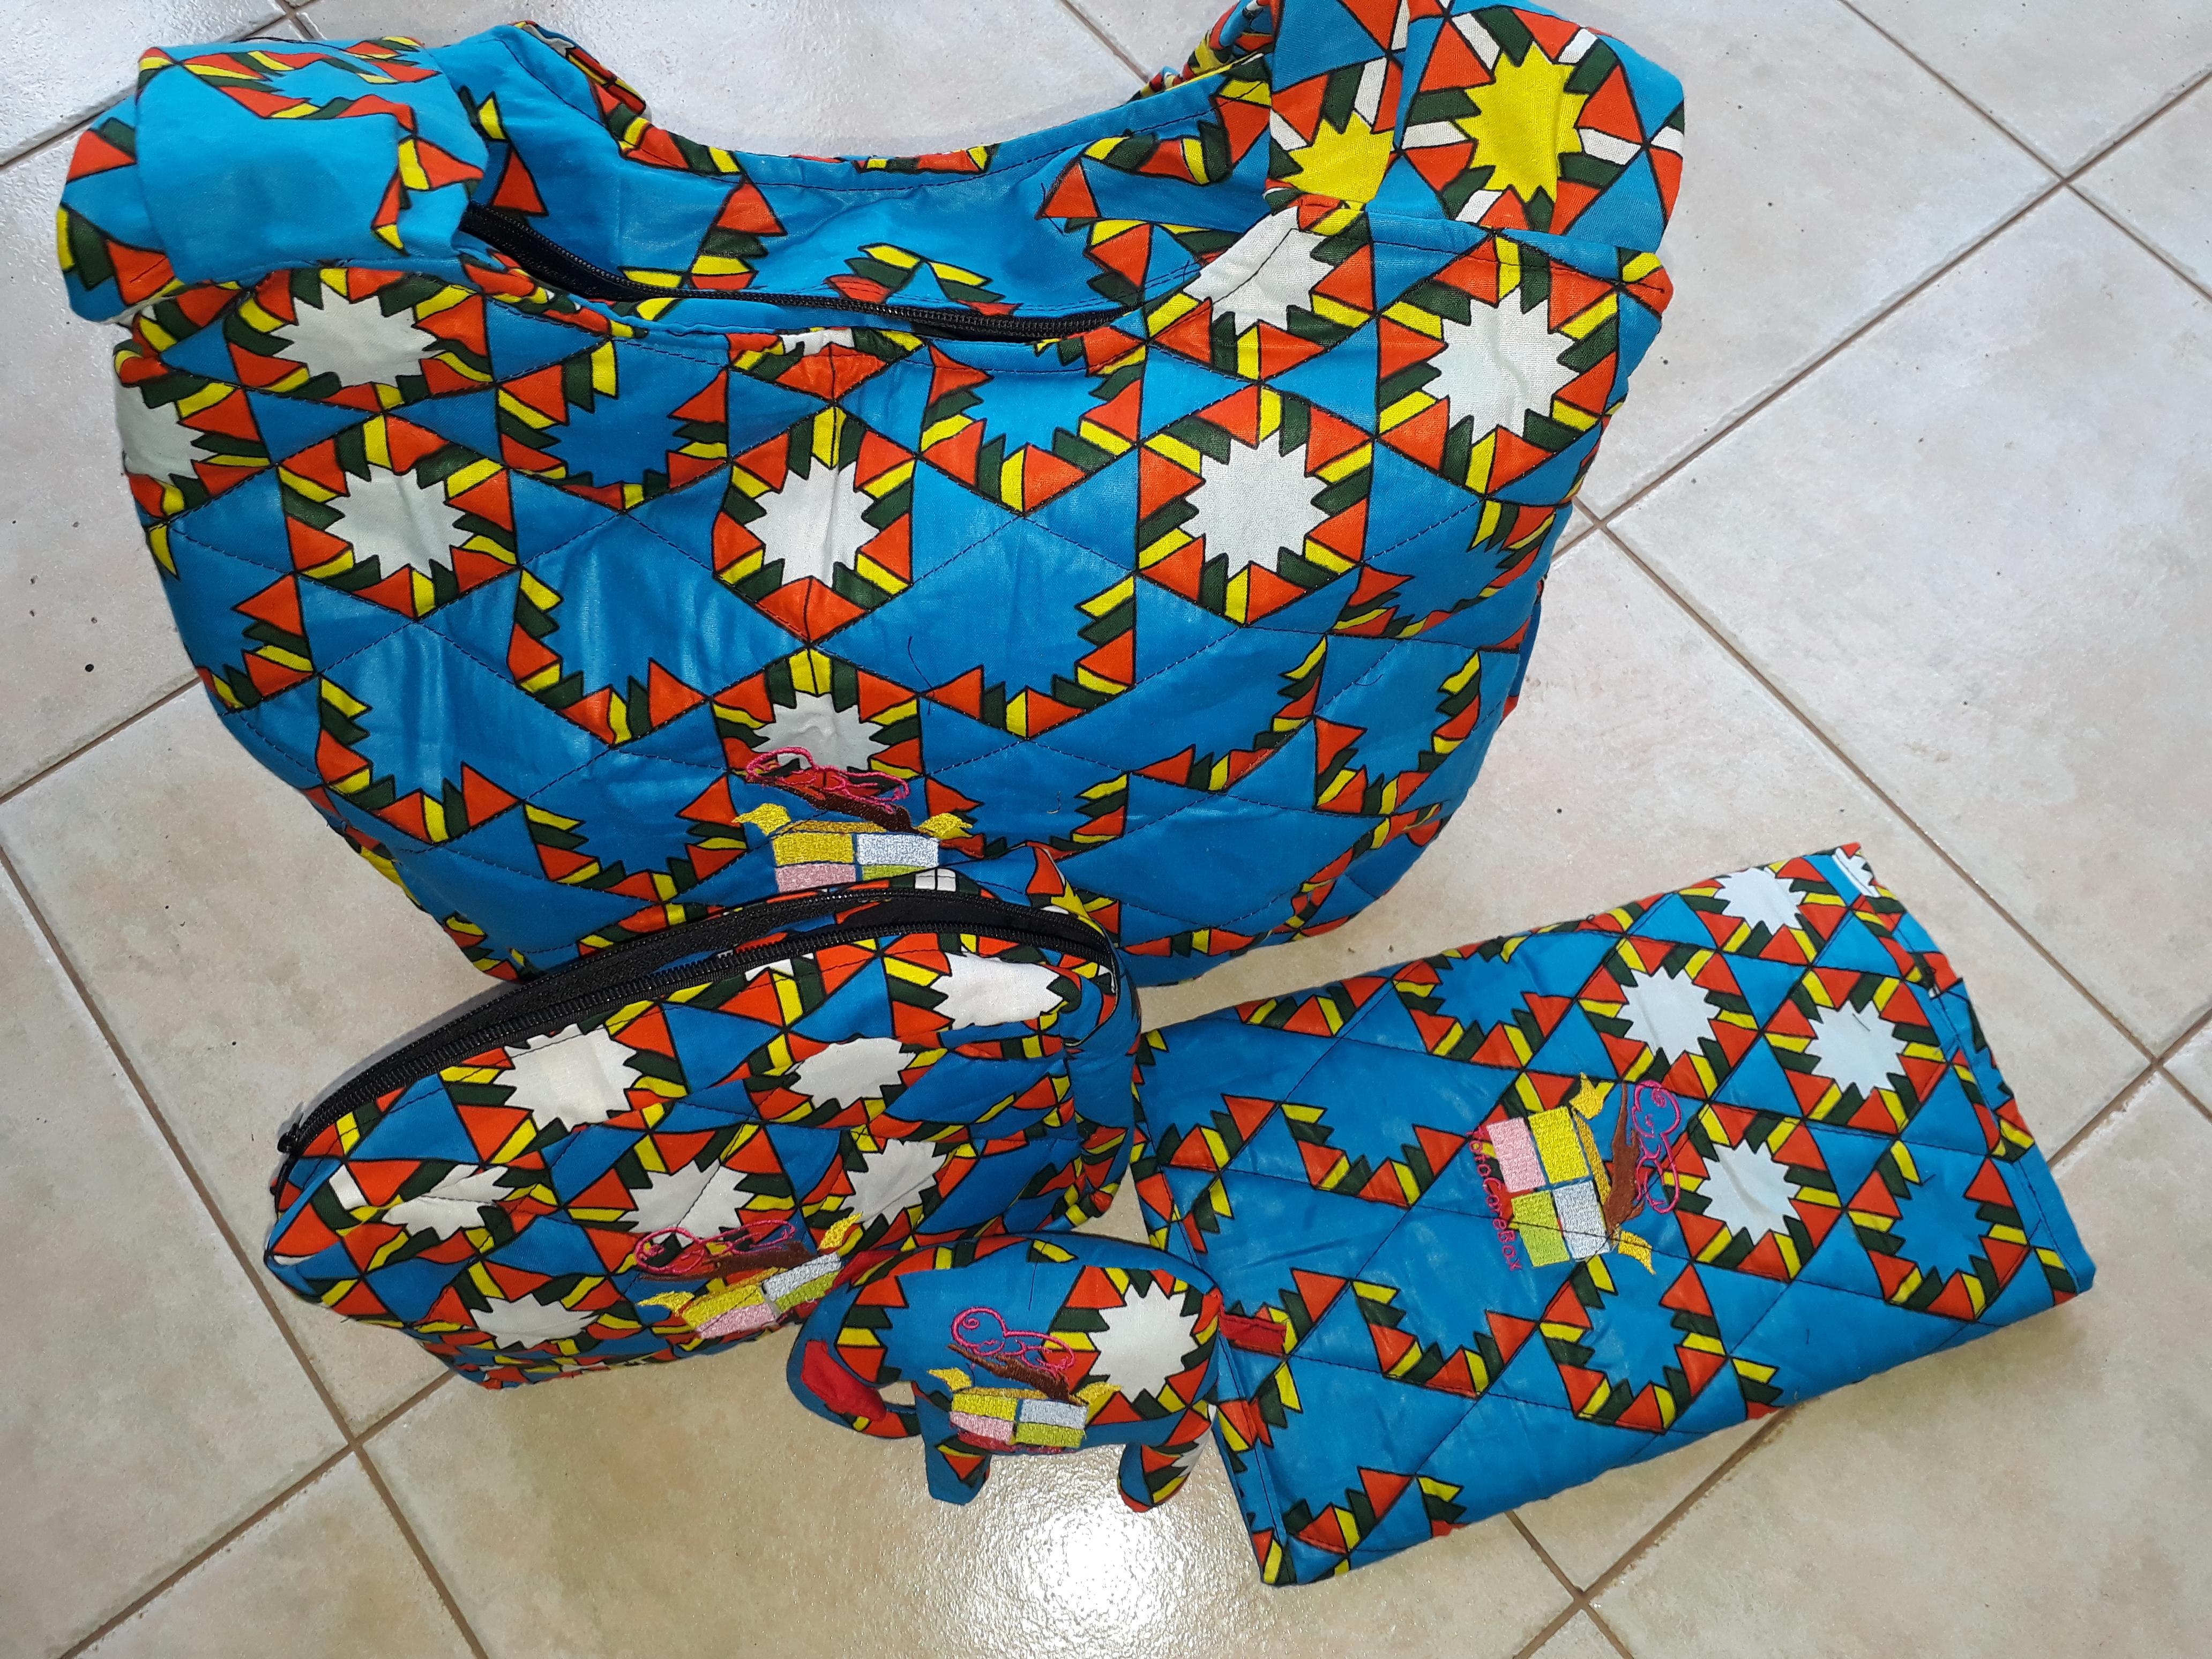 Toto Care Bags | Toto Care Box Africa Trust